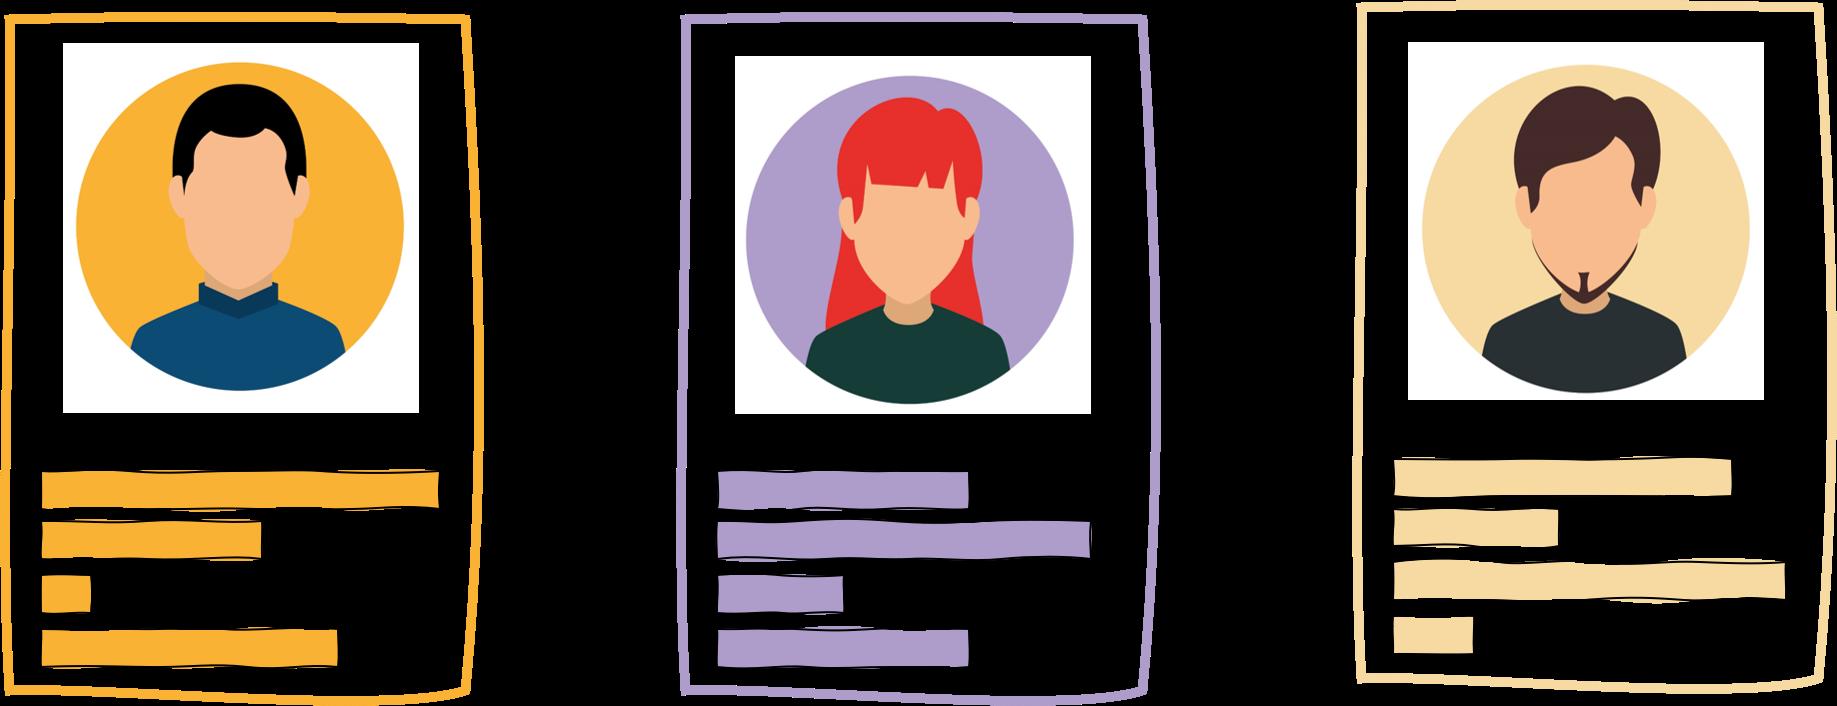 header-image-profiles